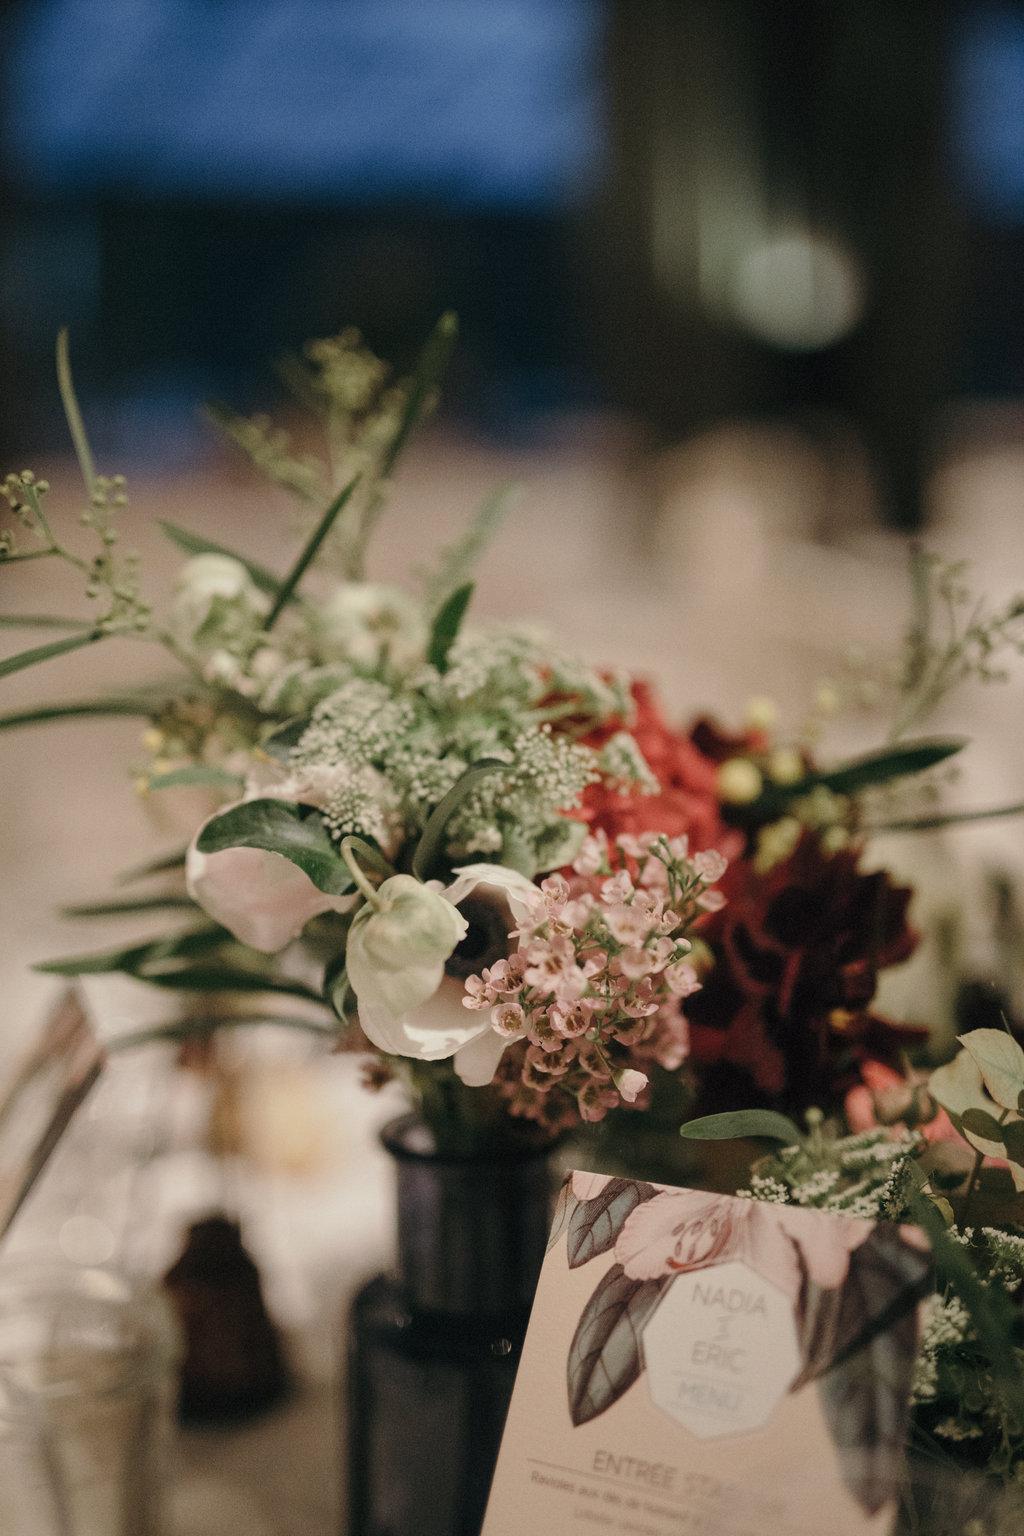 sebastienboudot-wedding-photographer-nadia-eric-436